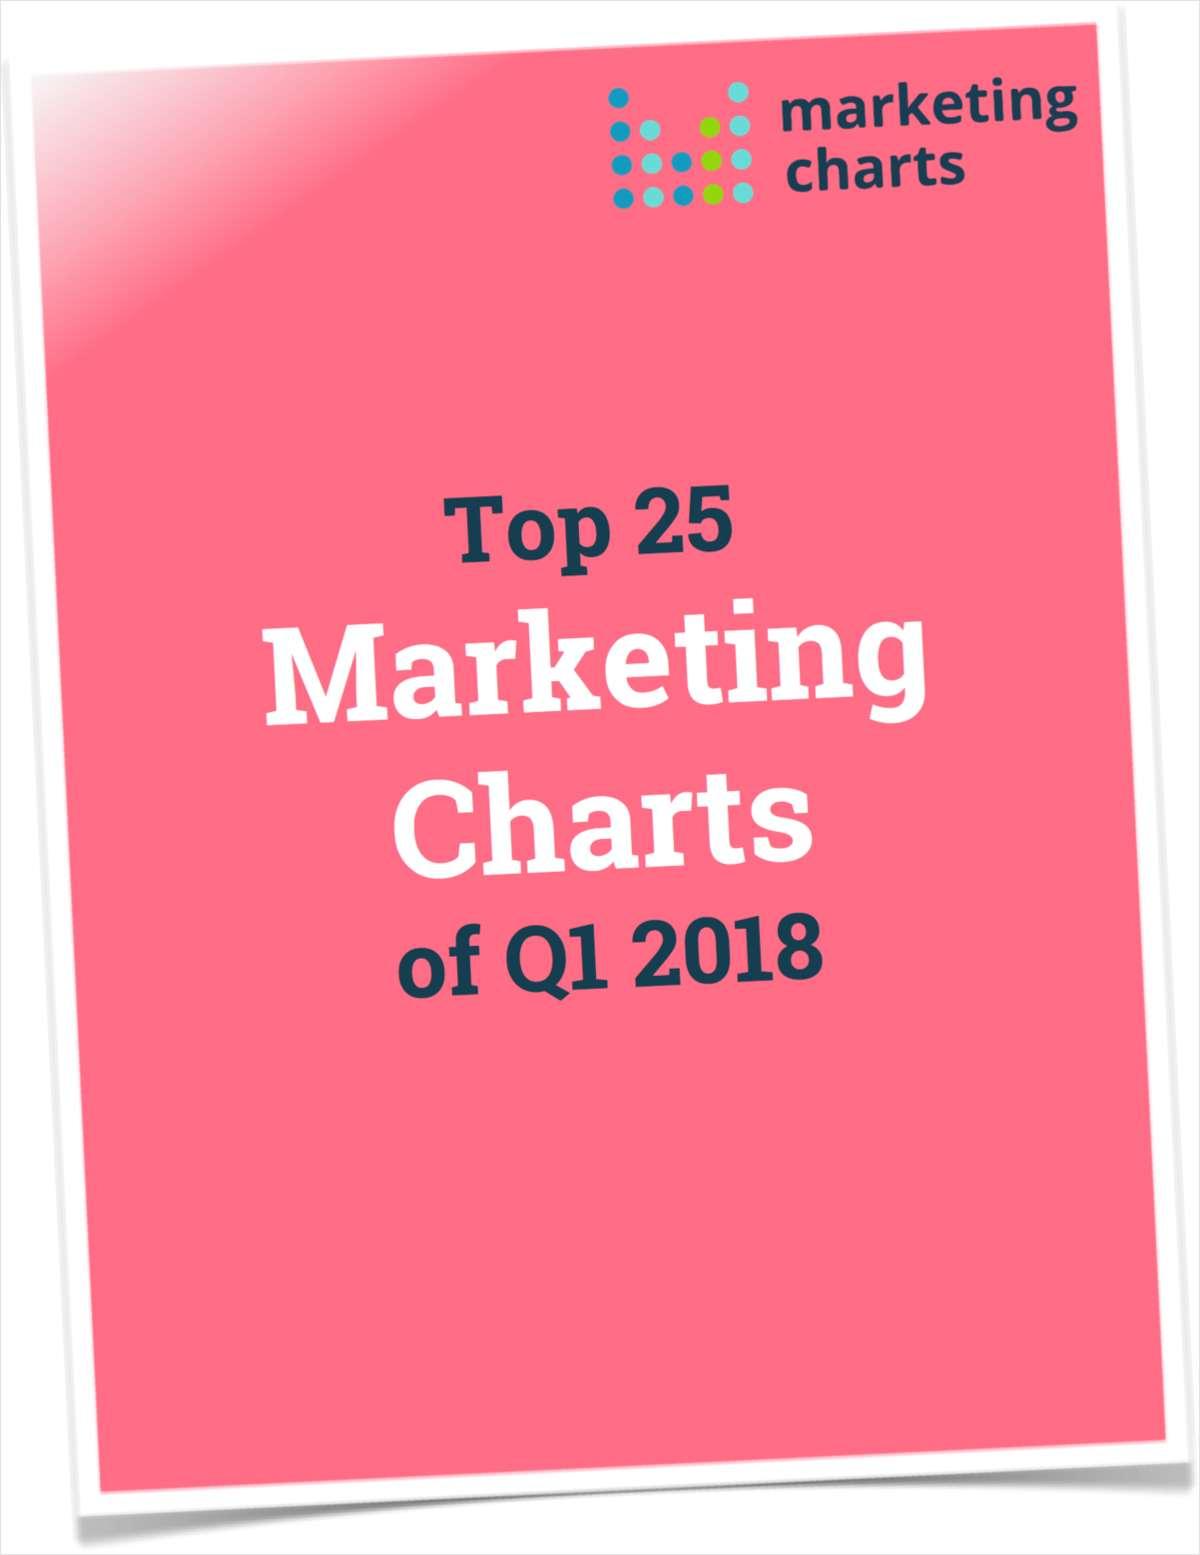 Top 25 Marketing Charts of Q1 2018